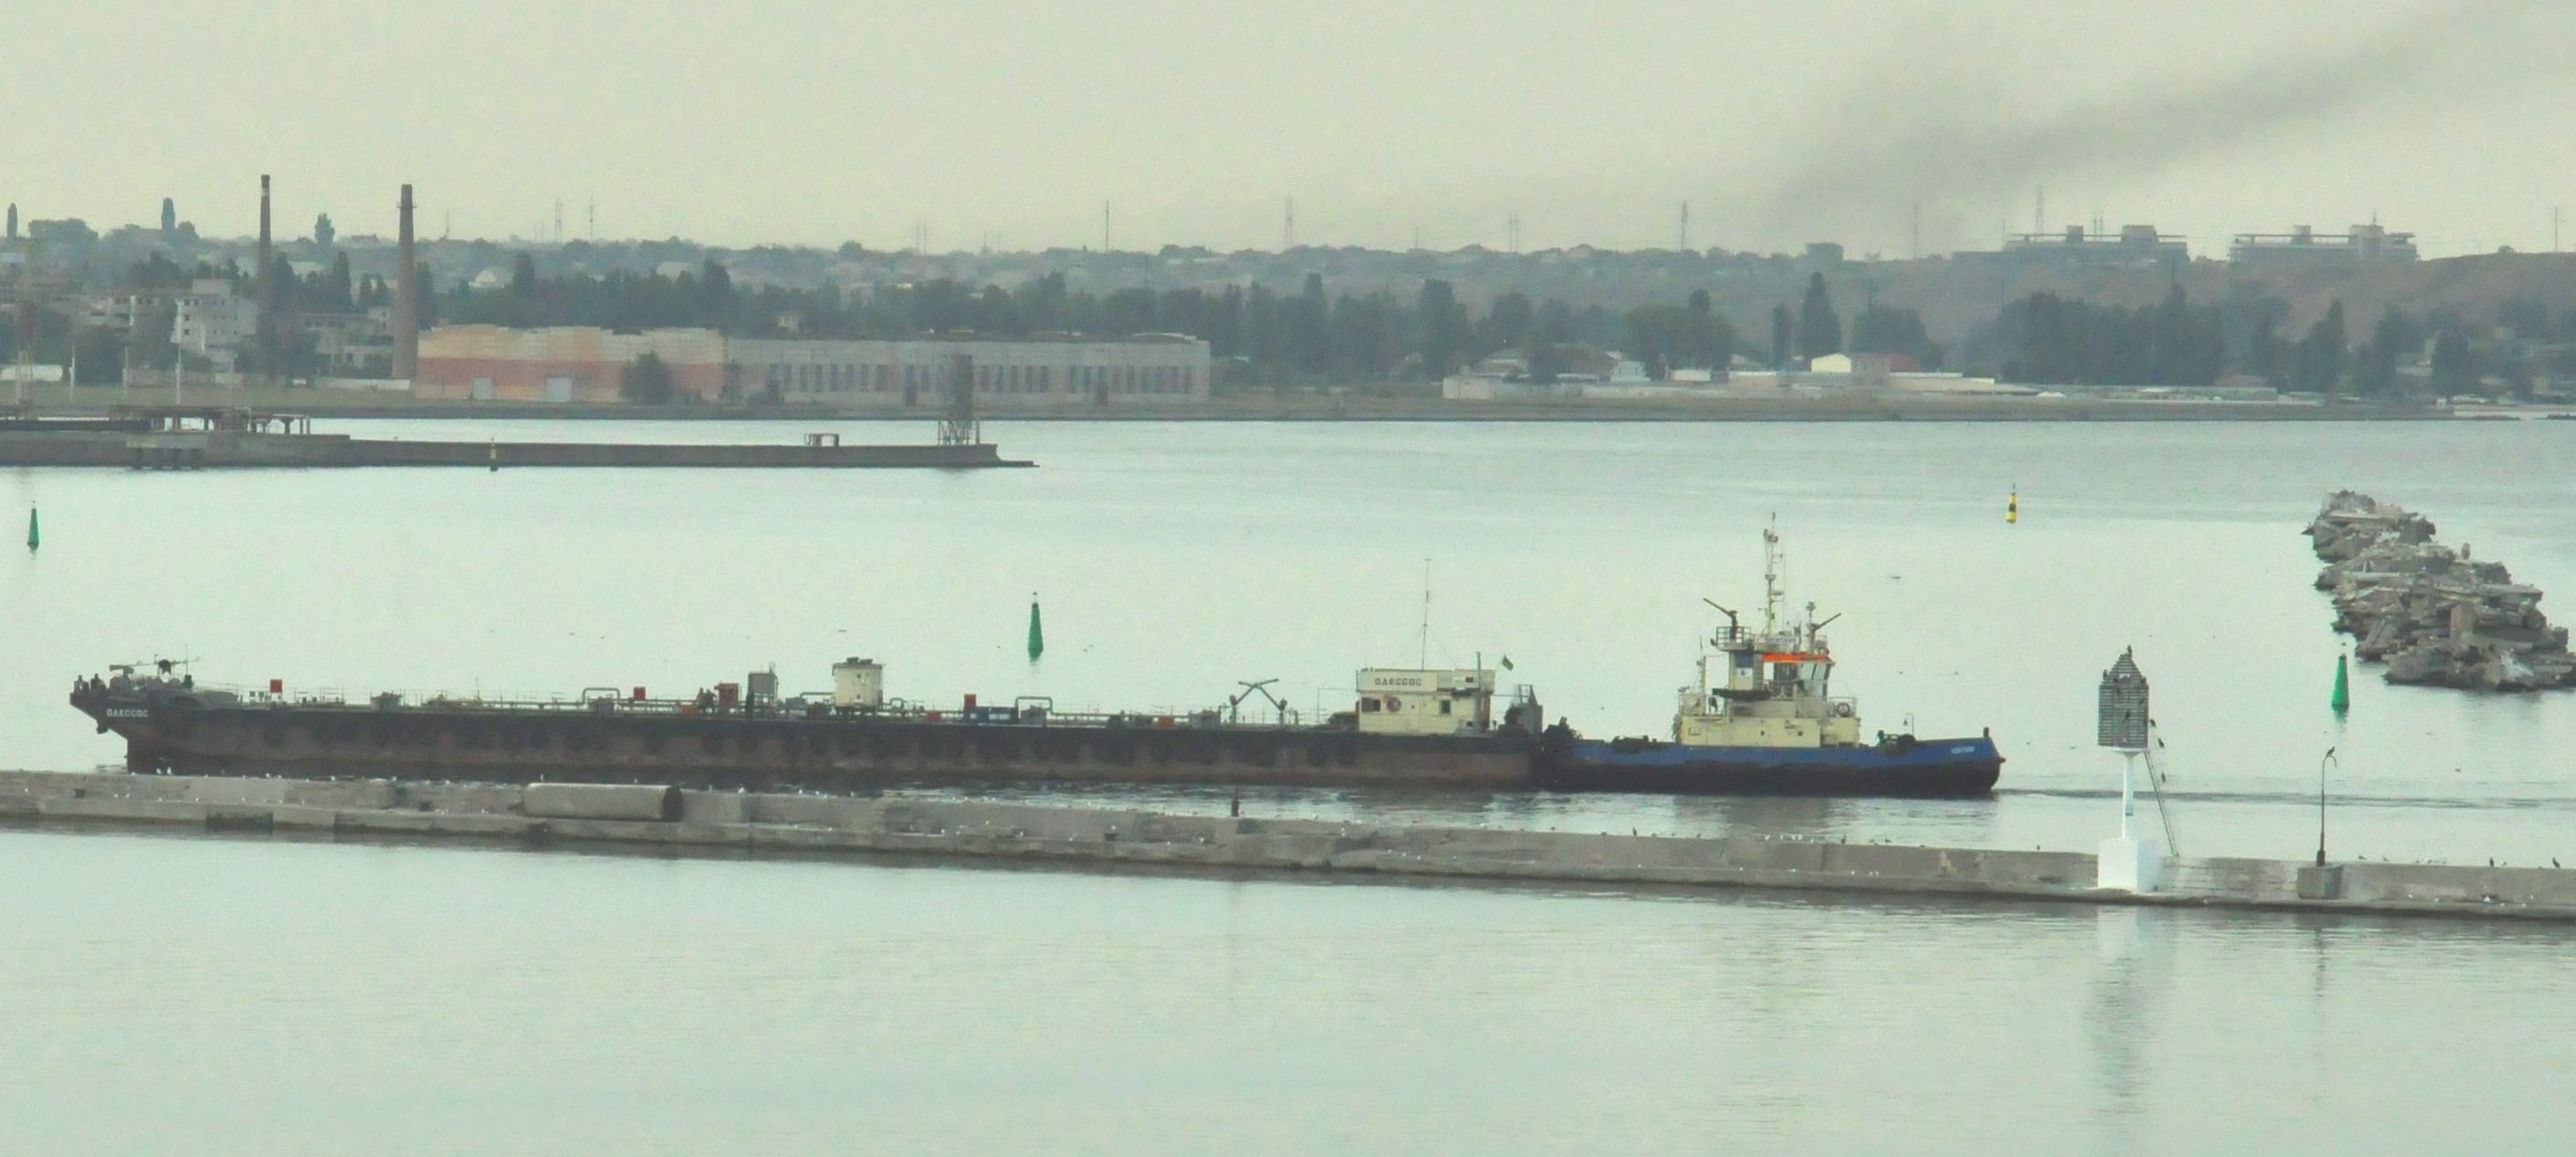 Судноремонтники Одеського порту прийняли в ремонт баржу «Одессос»